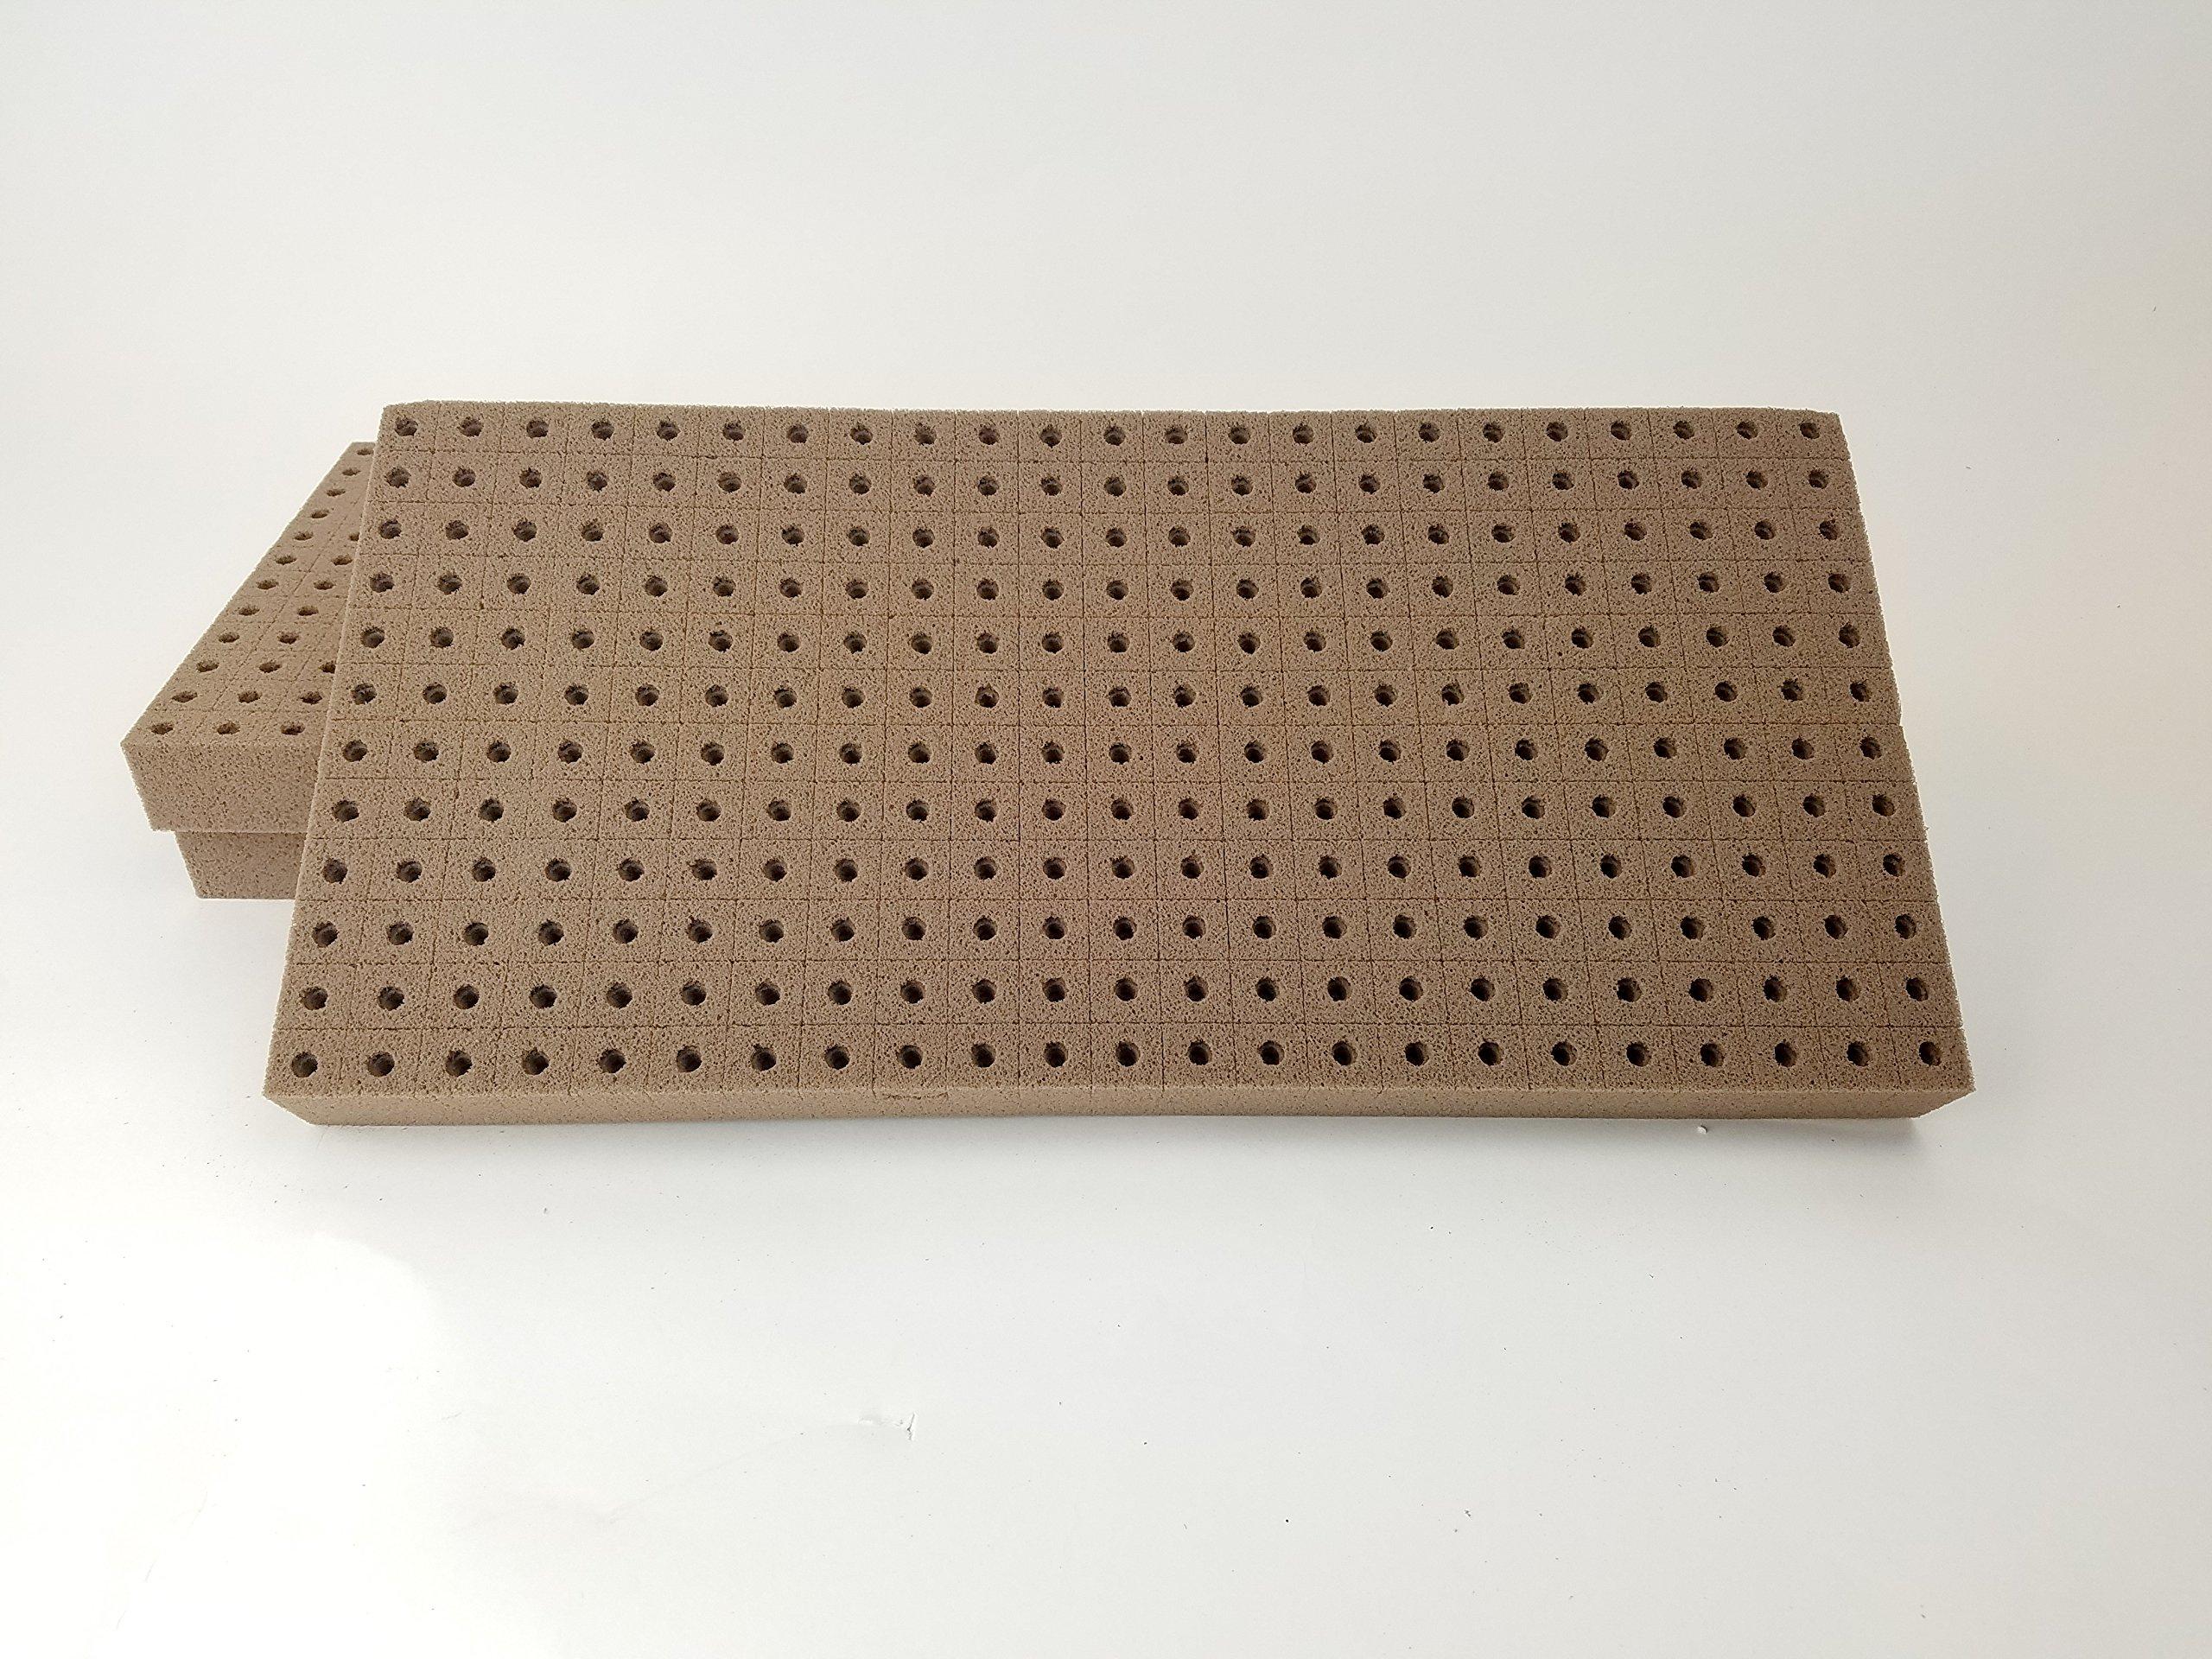 Oasis Horticubes ES Grow Cubes 276ct Sheet - Biodegradable Cubes (20)